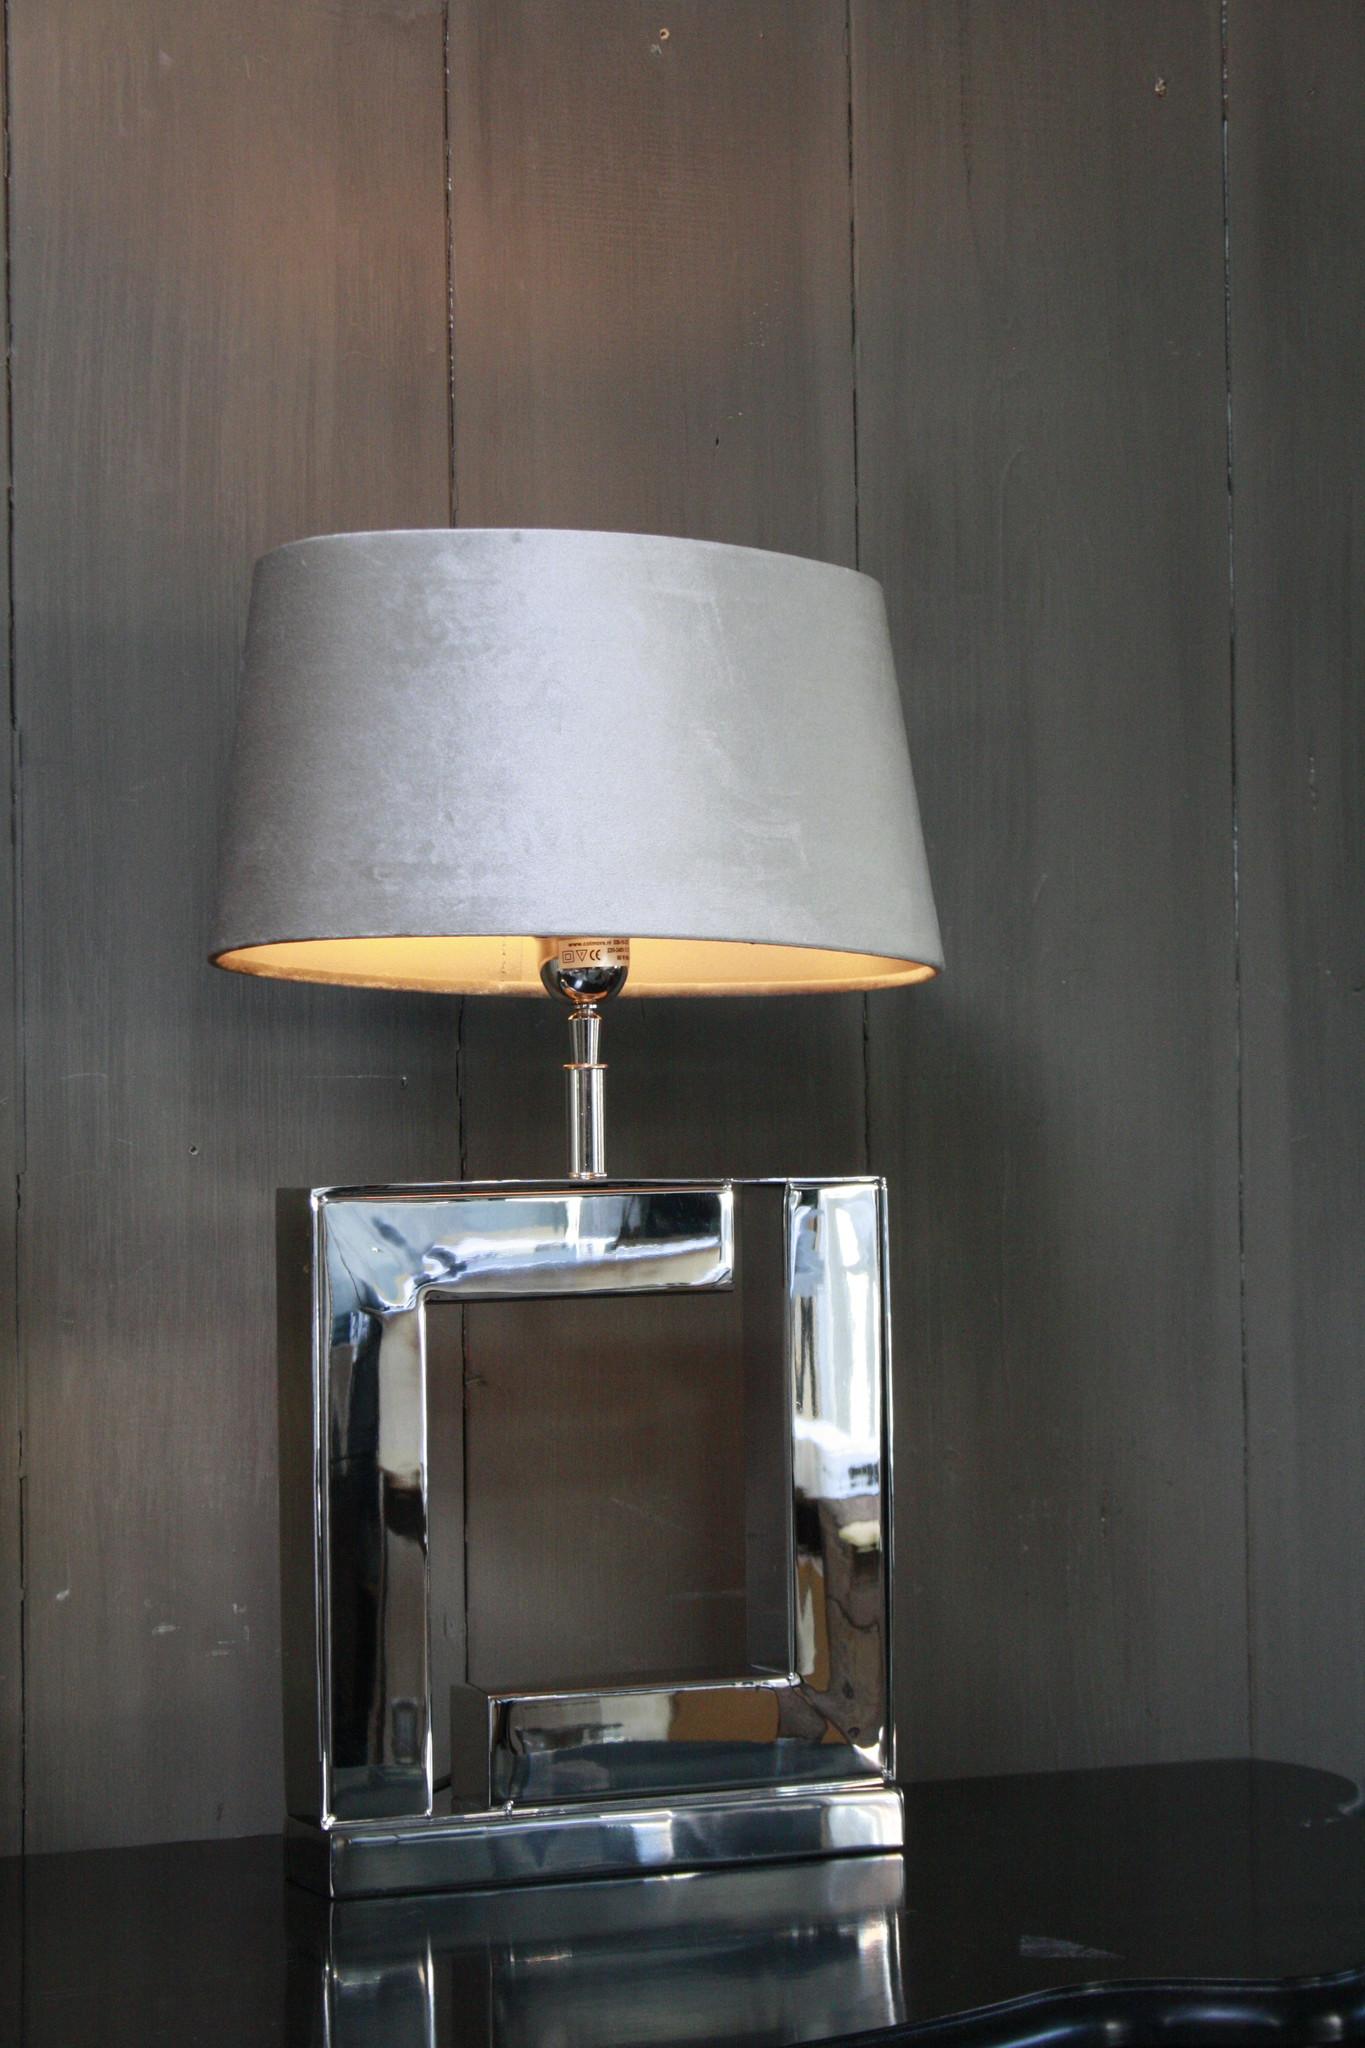 Tafellamp Vierkant Zilver + Velours kap Eric Kuster-2